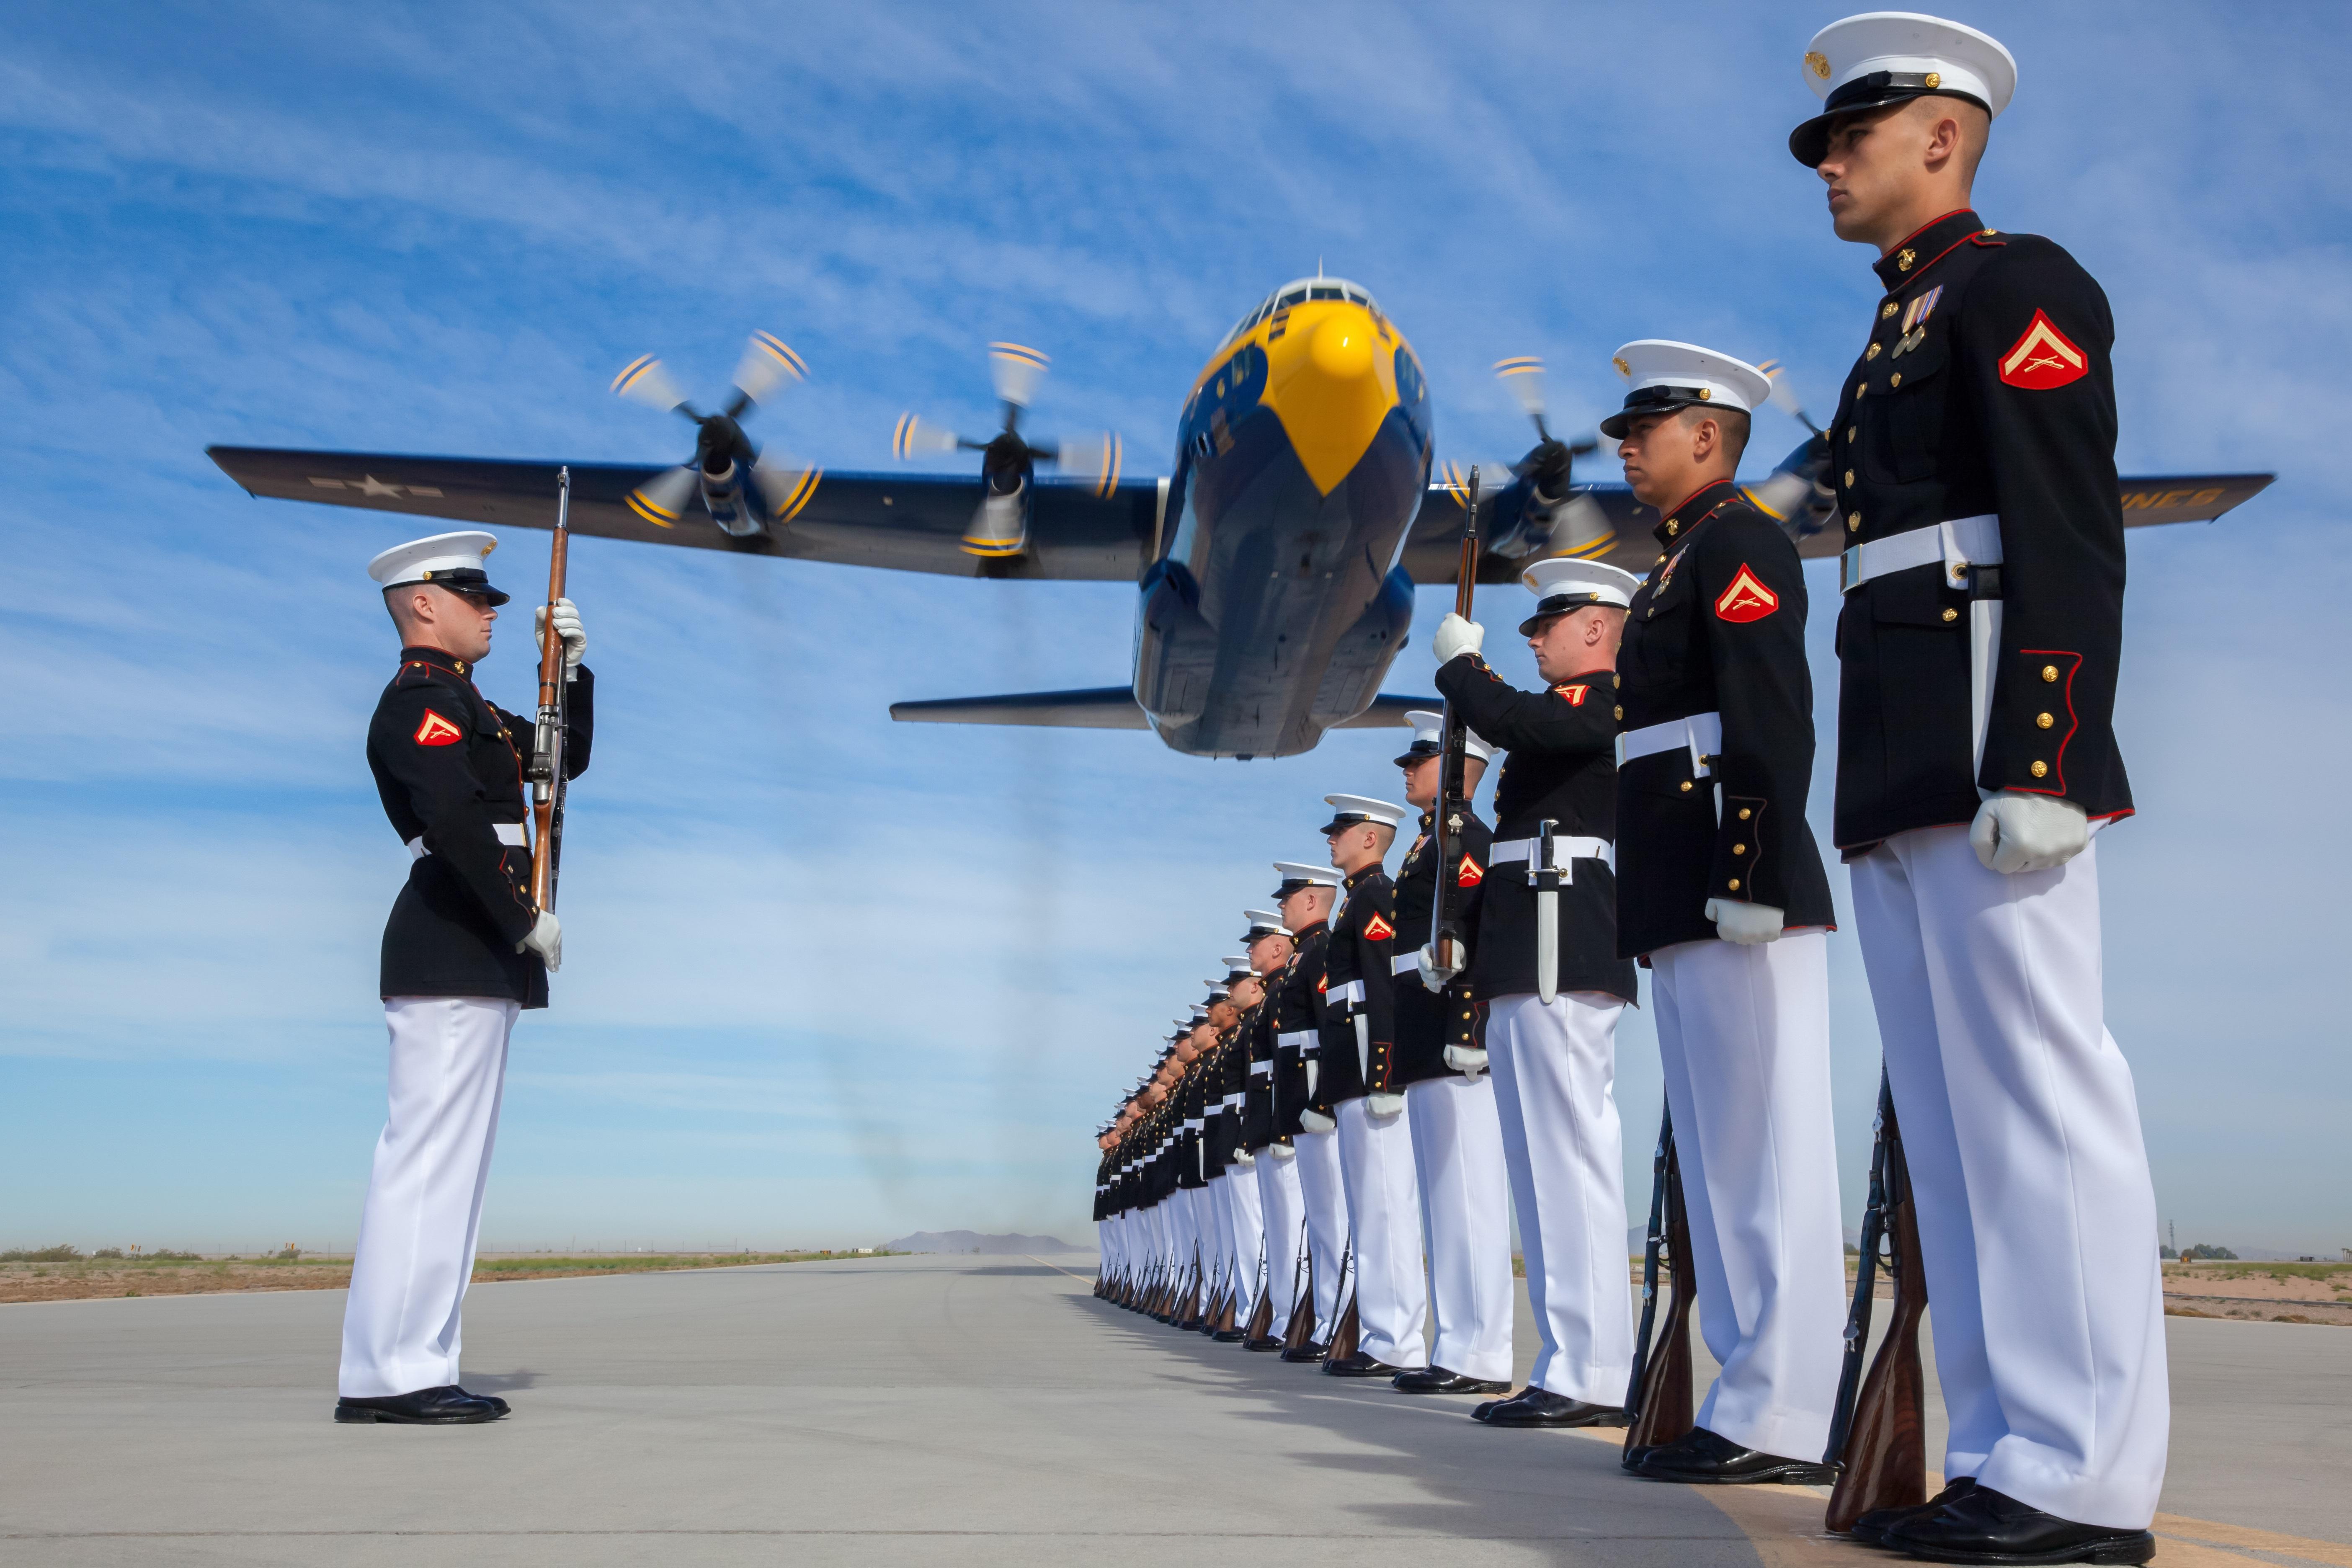 https://s3.us-east-2.amazonaws.com/withjamesbarr/genres/marines-plane.jpeg